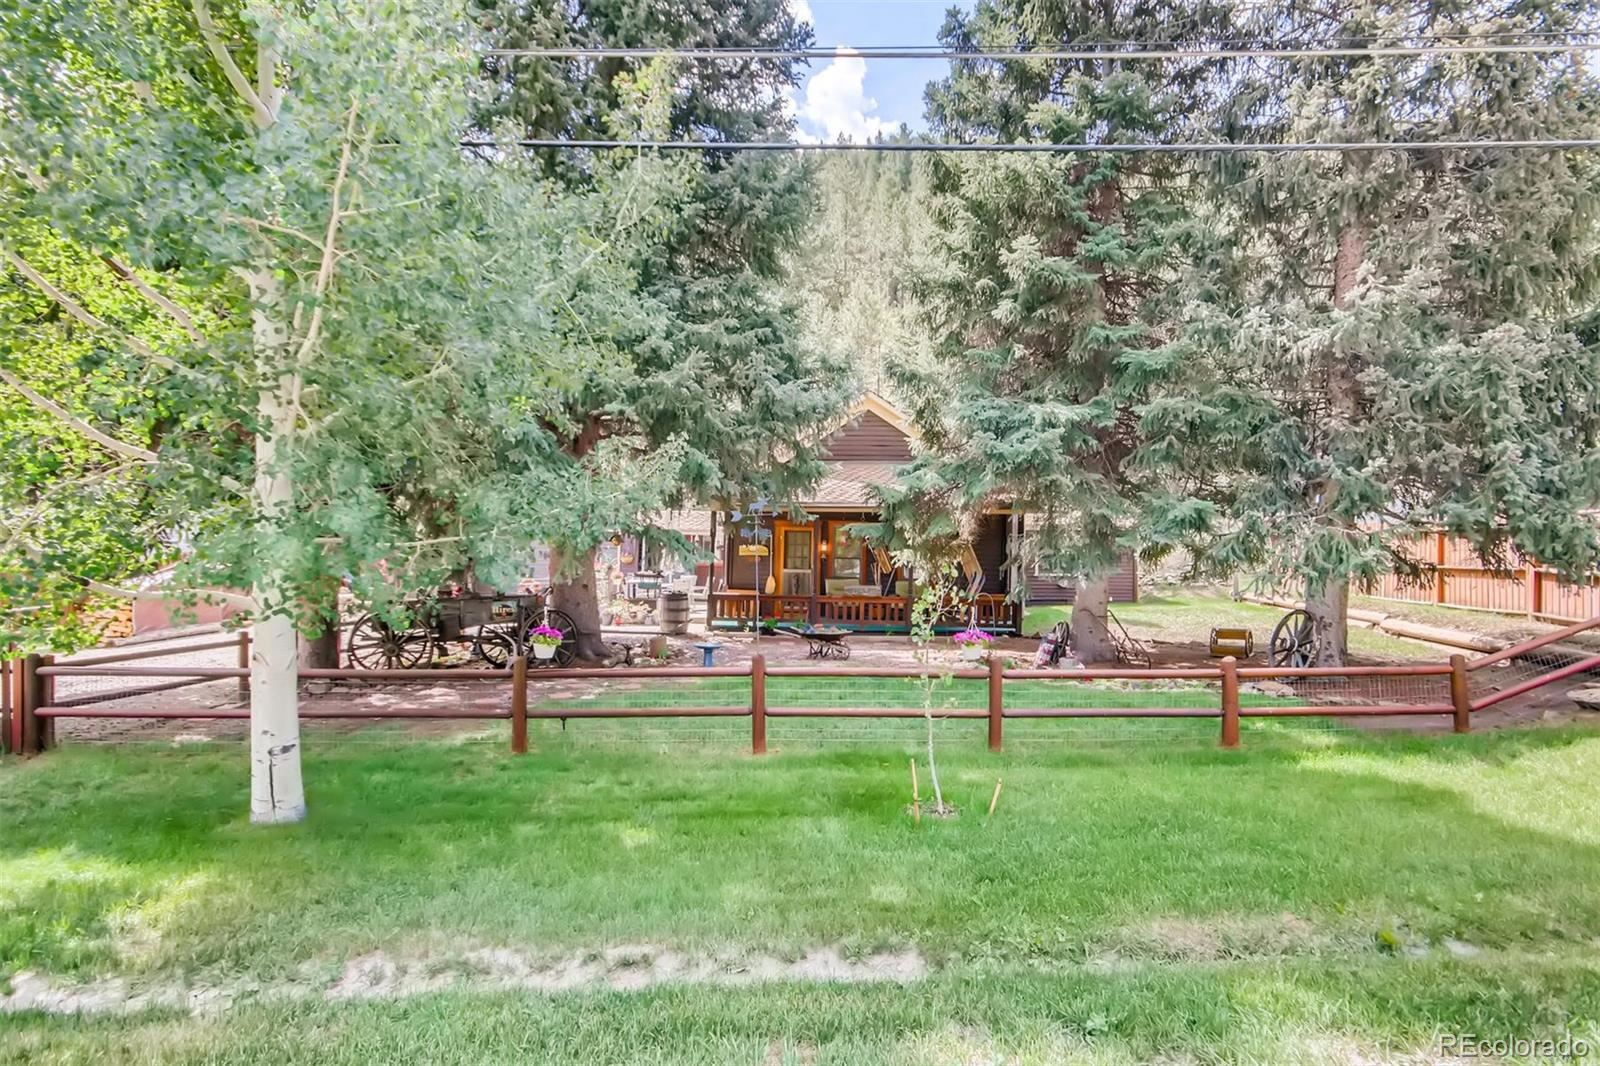 971 Colorado 103, Idaho Springs, CO 80452 - #: 1569416